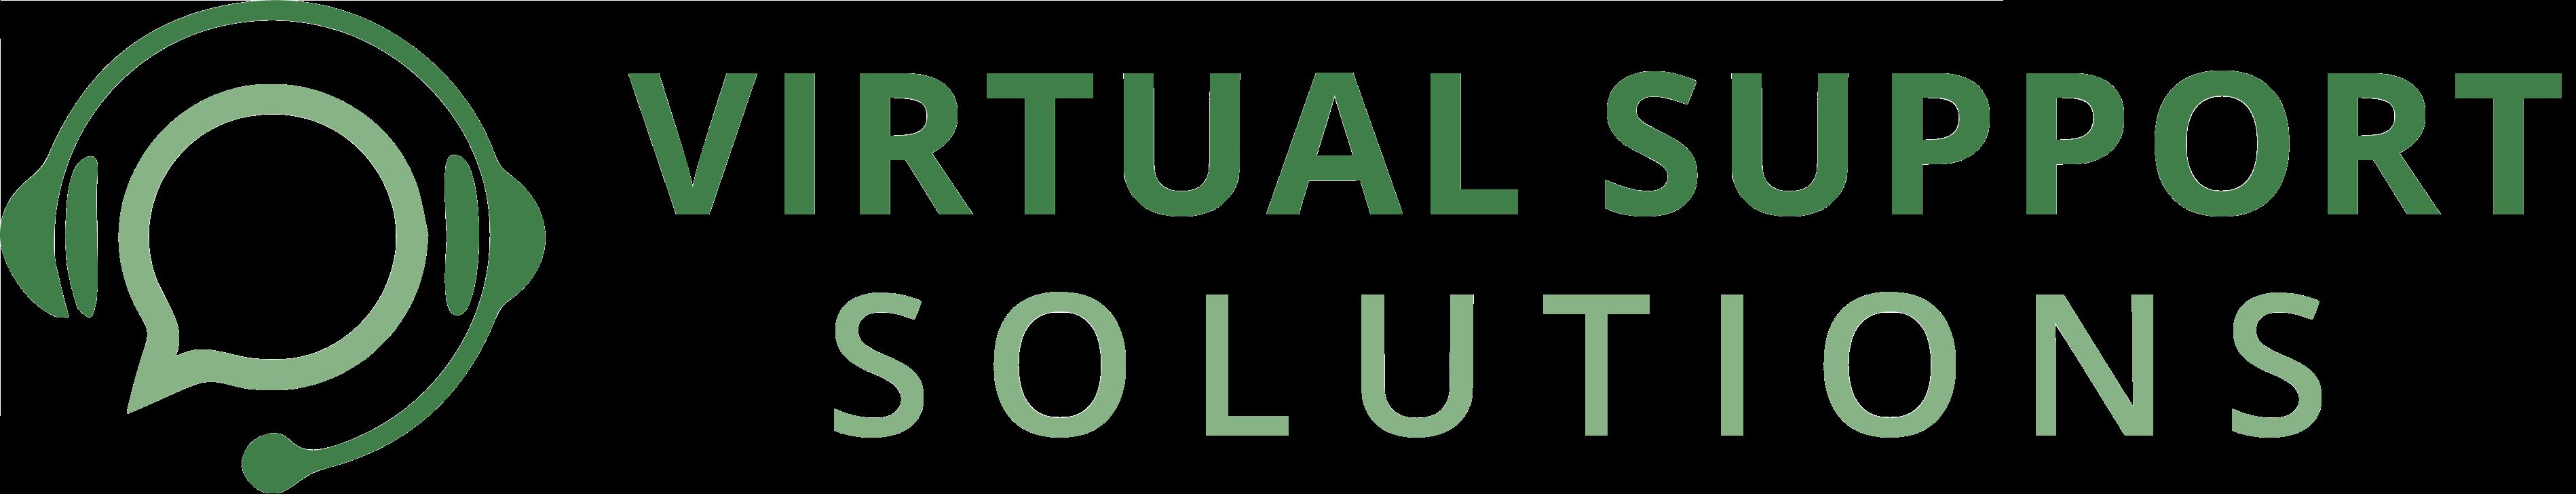 Dental Virtual Support Solutions